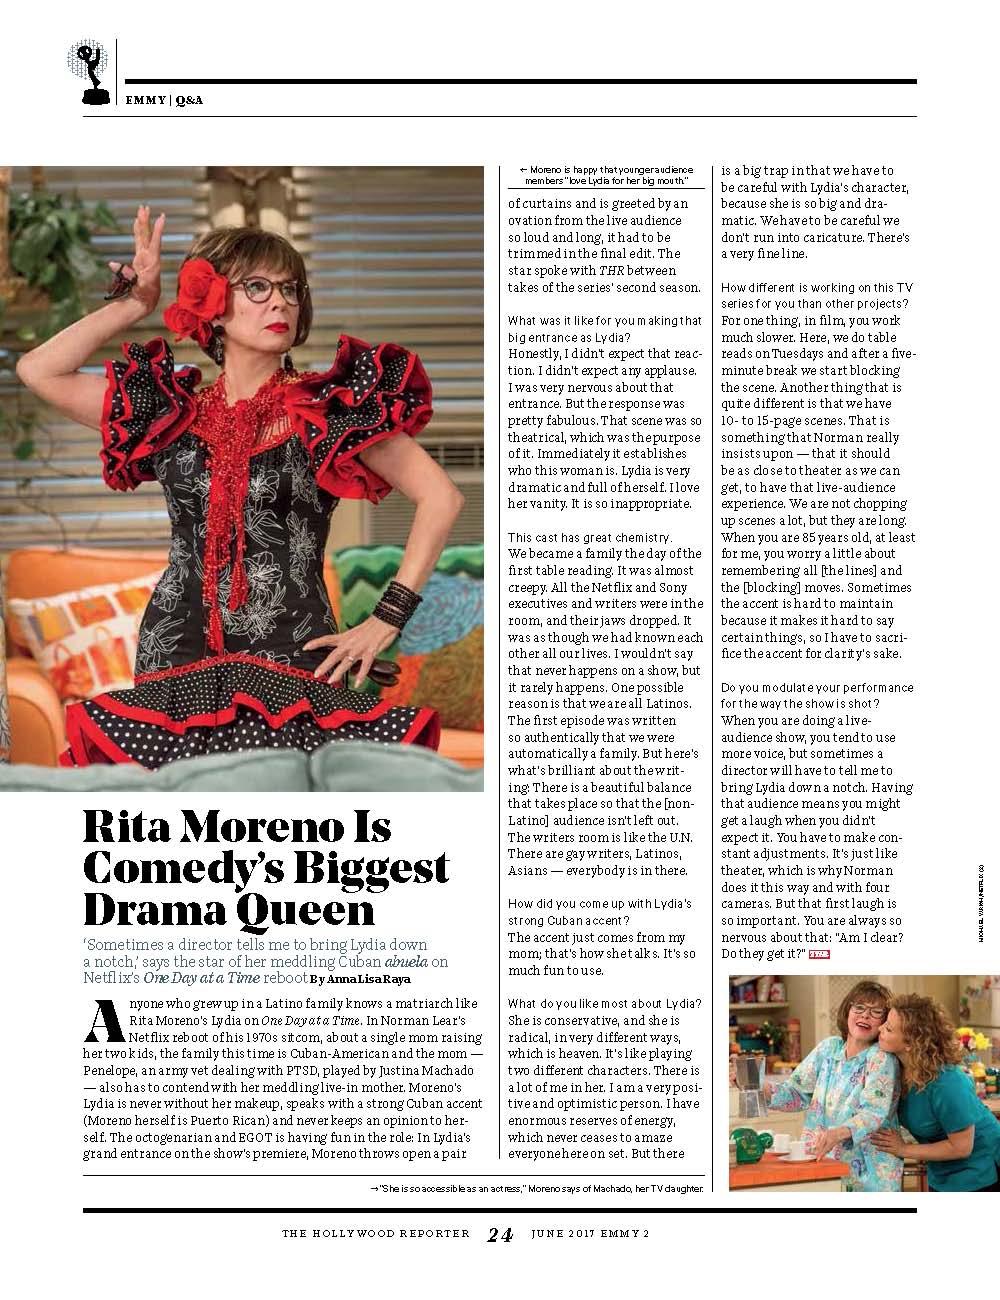 Rita Moreno Emmys Q&A